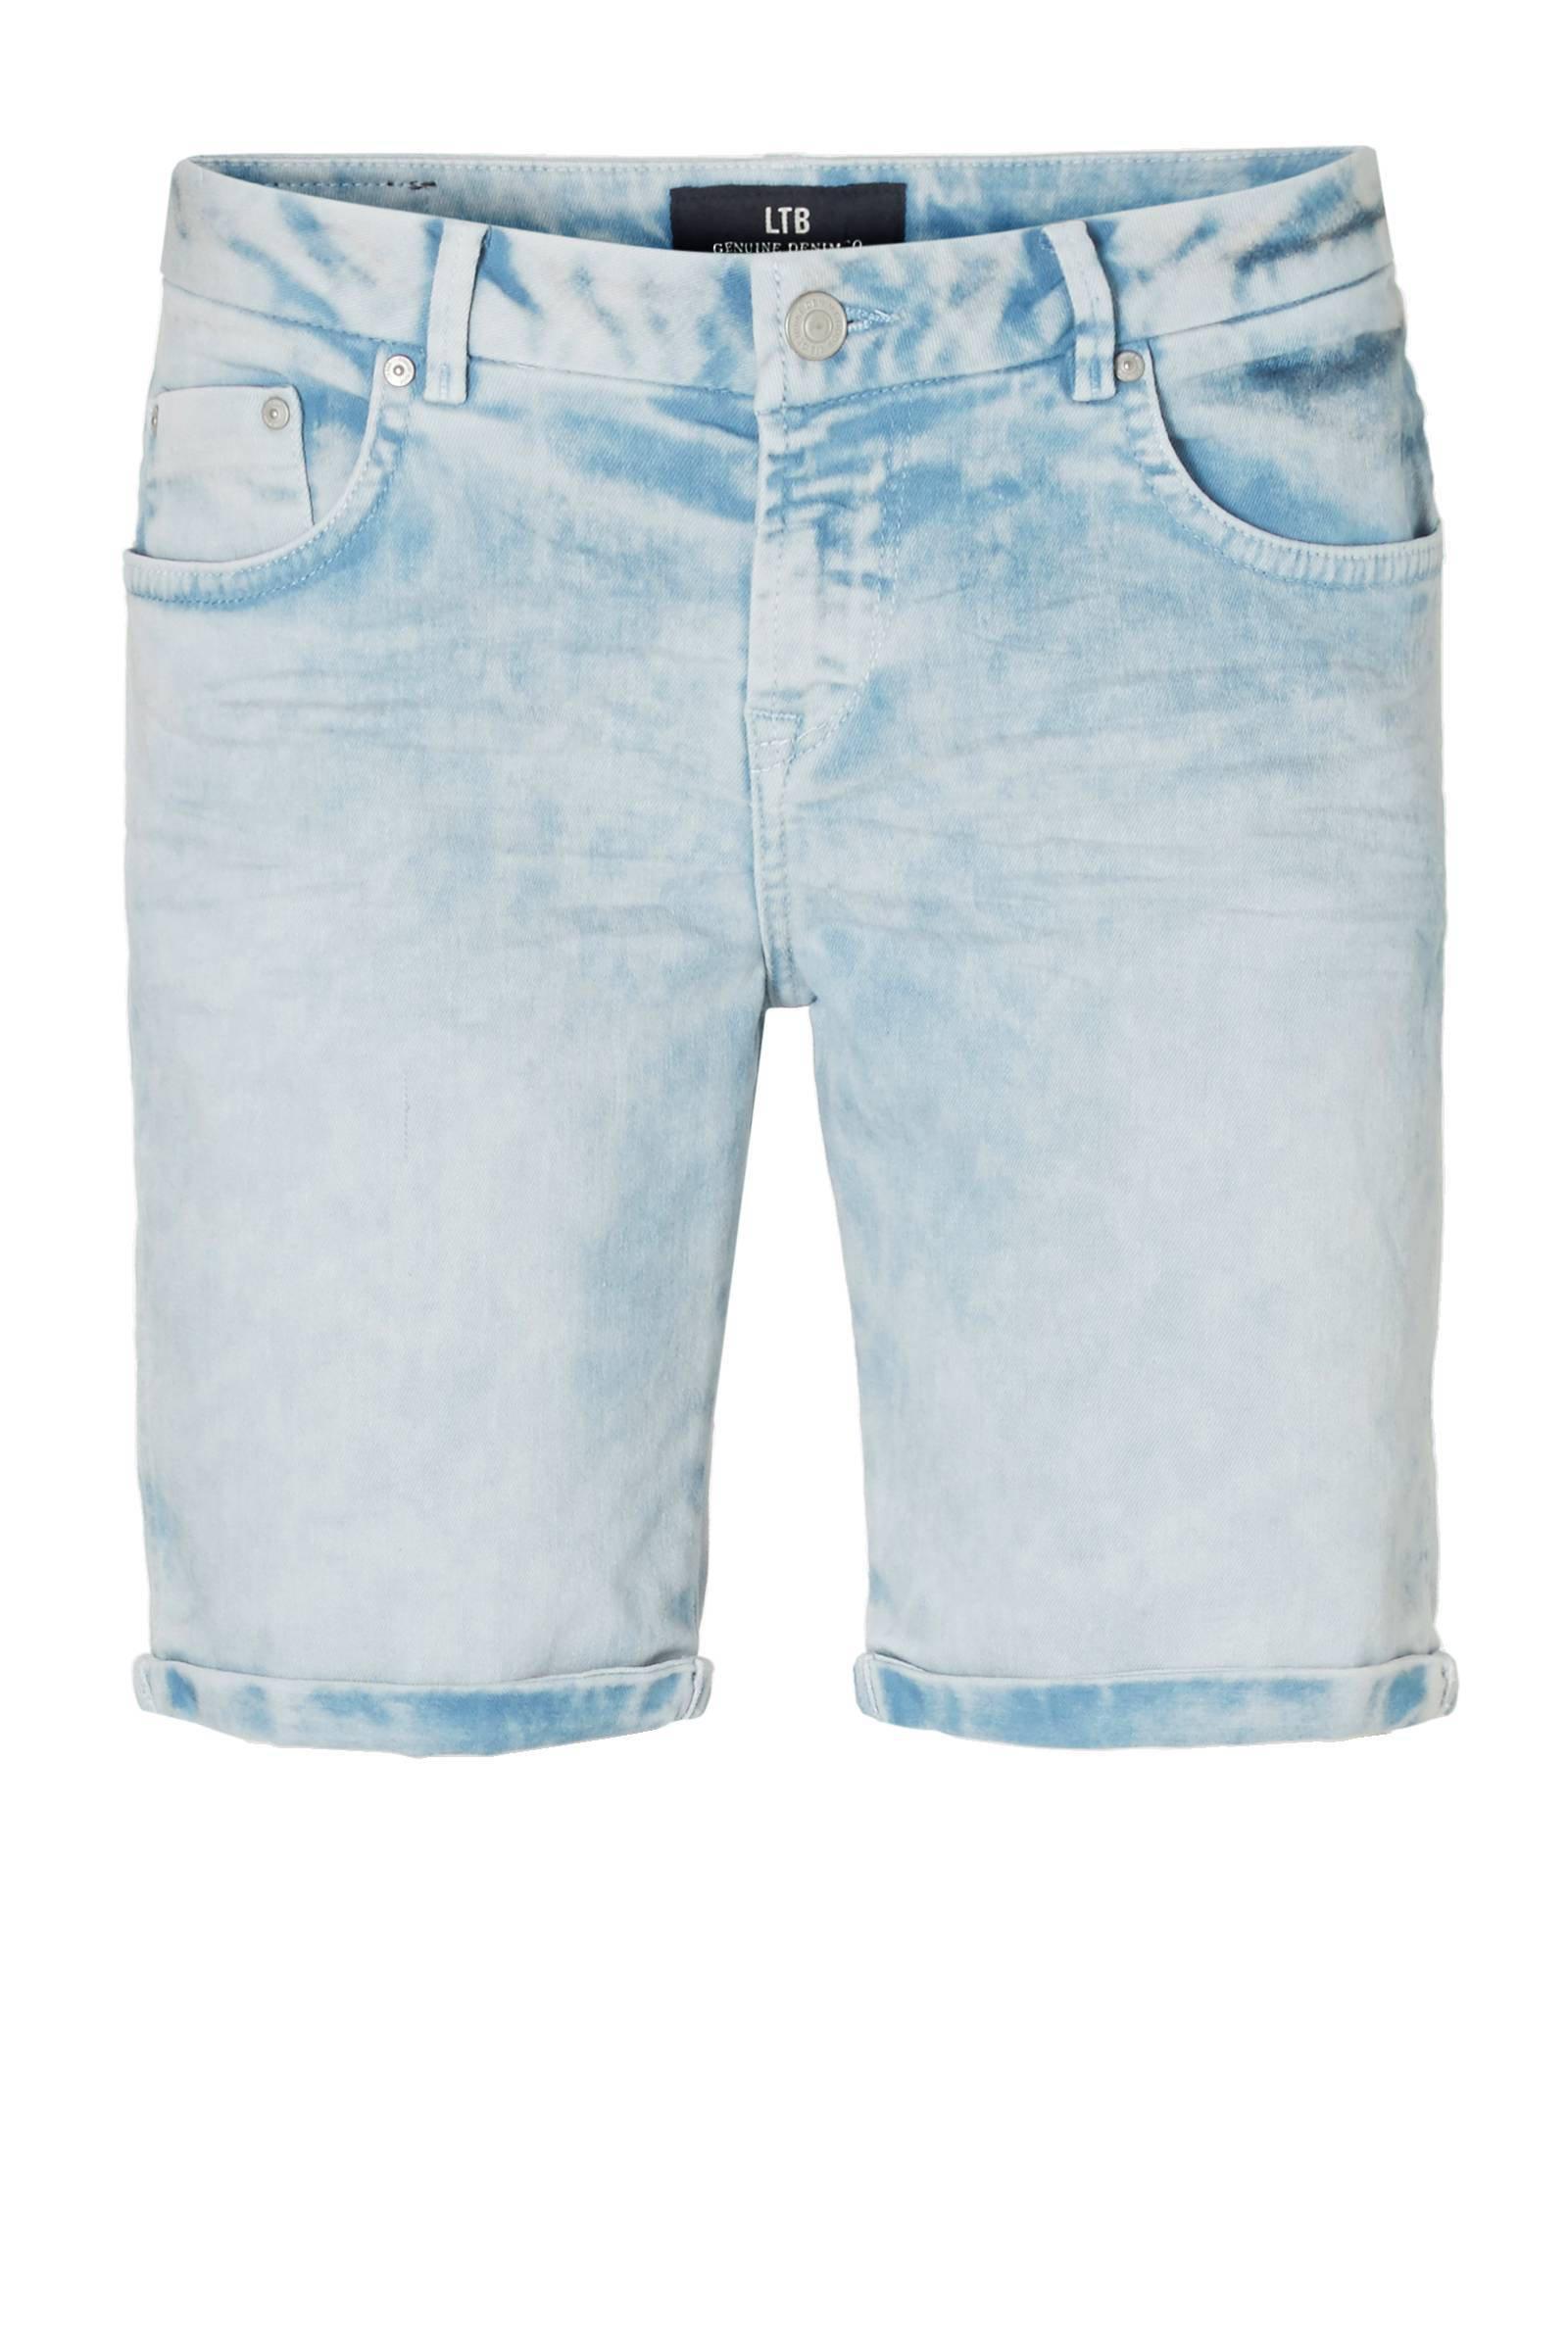 Korte Broek Jeans Dames.Ltb Becky Short Wehkamp